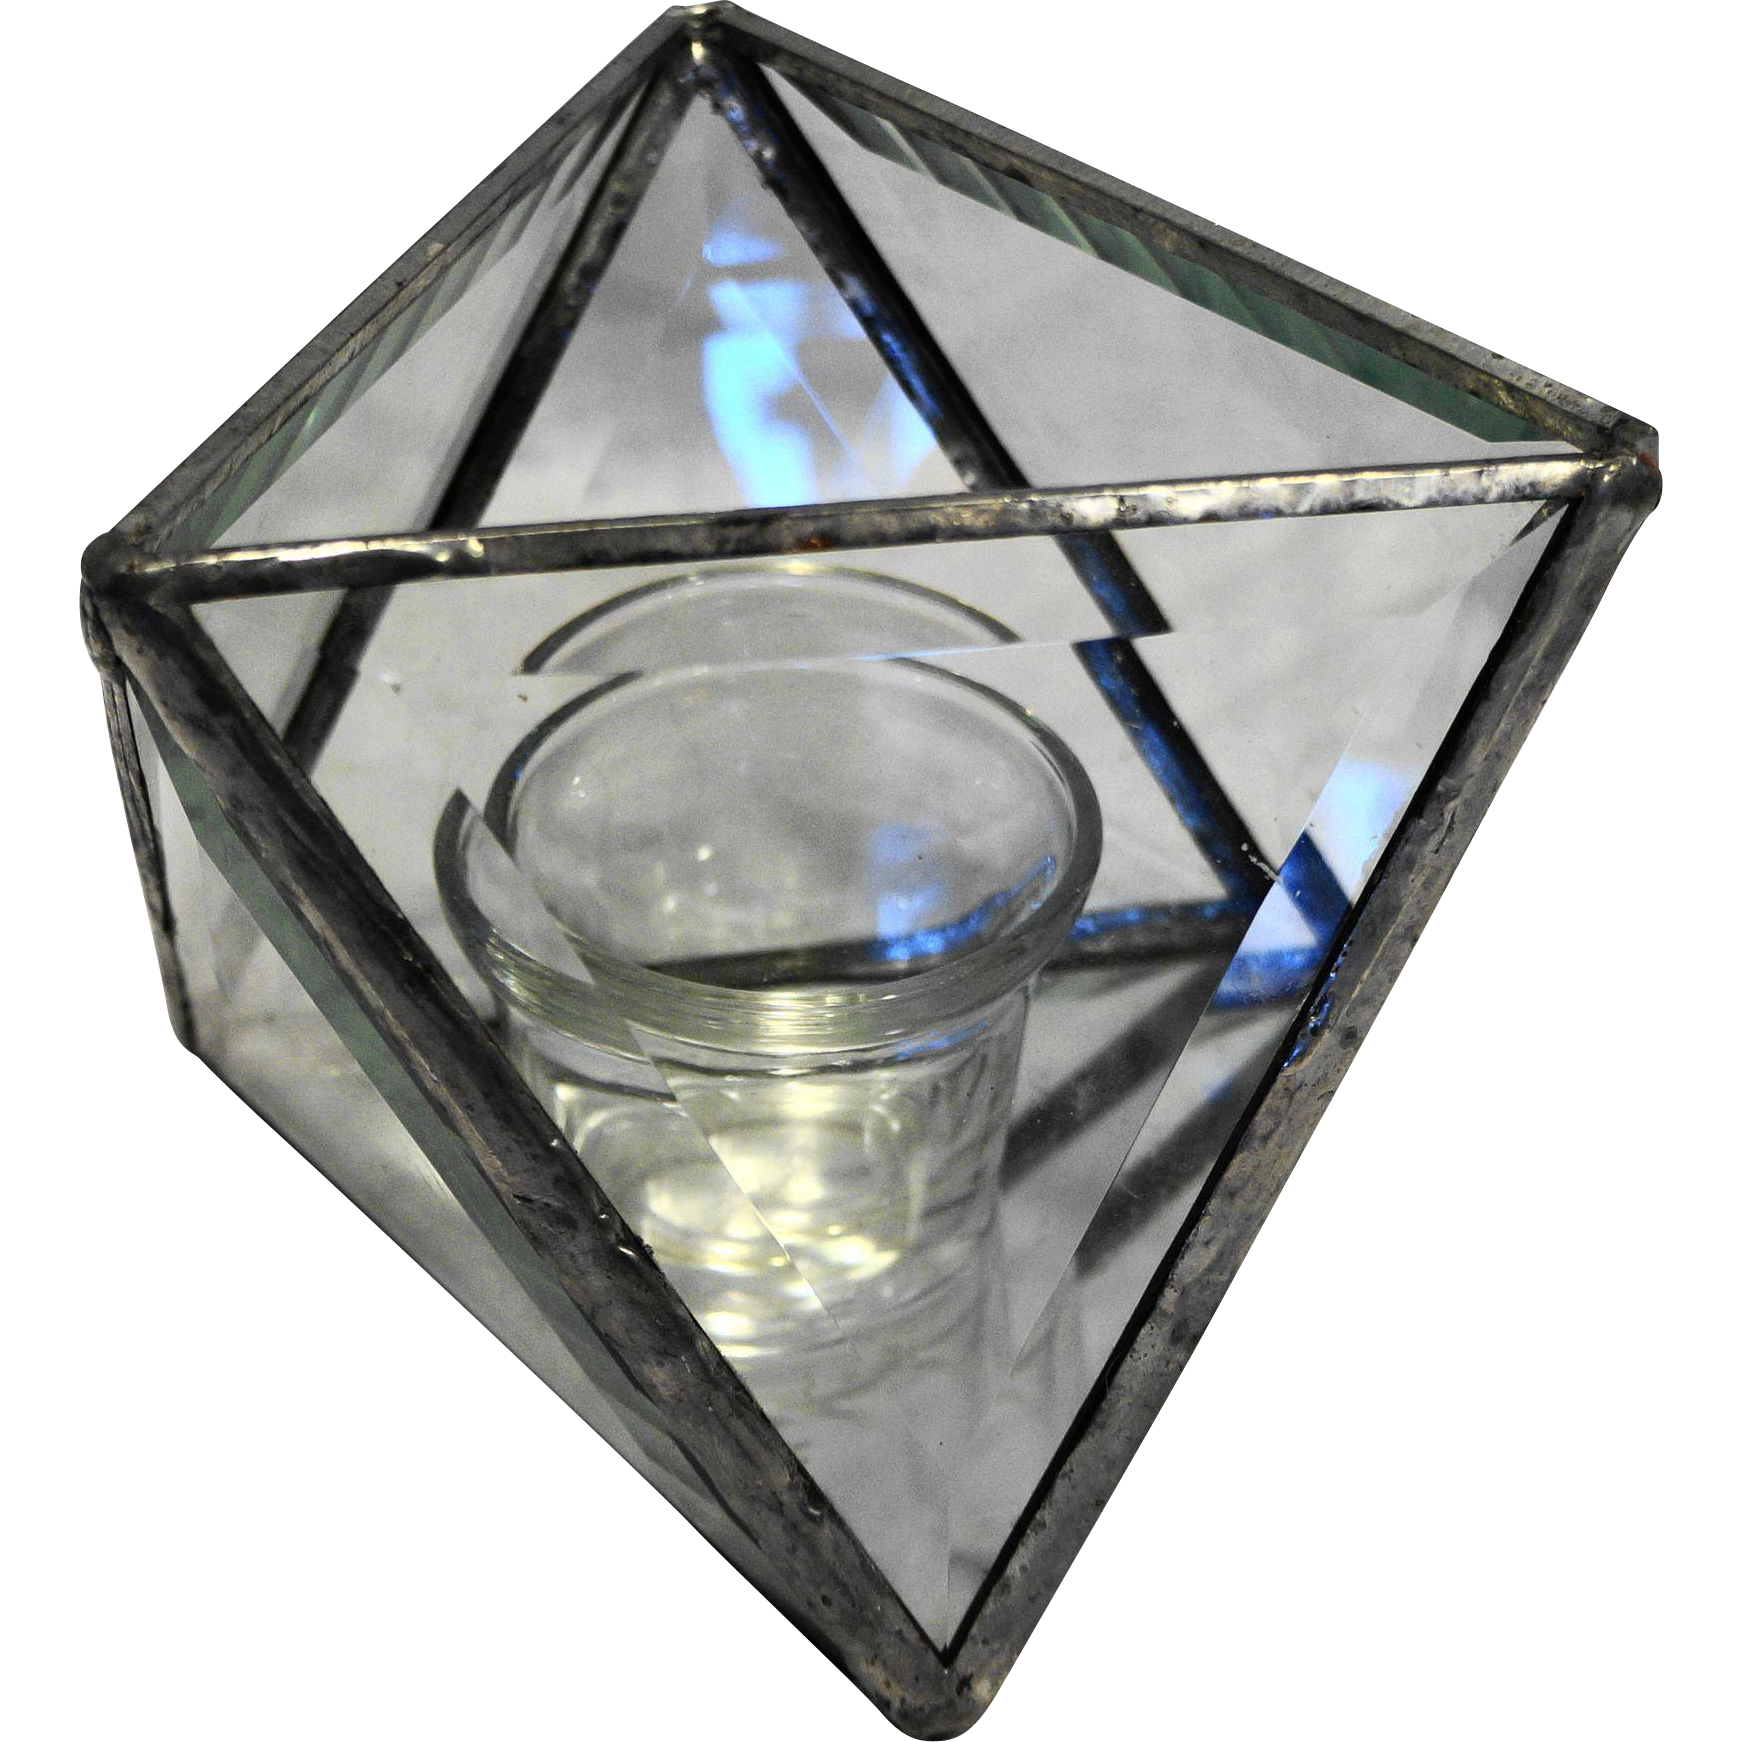 Beveled Glass Mirror Base Octahedron Open Box Terrarium Candle Holder Triangle Panels